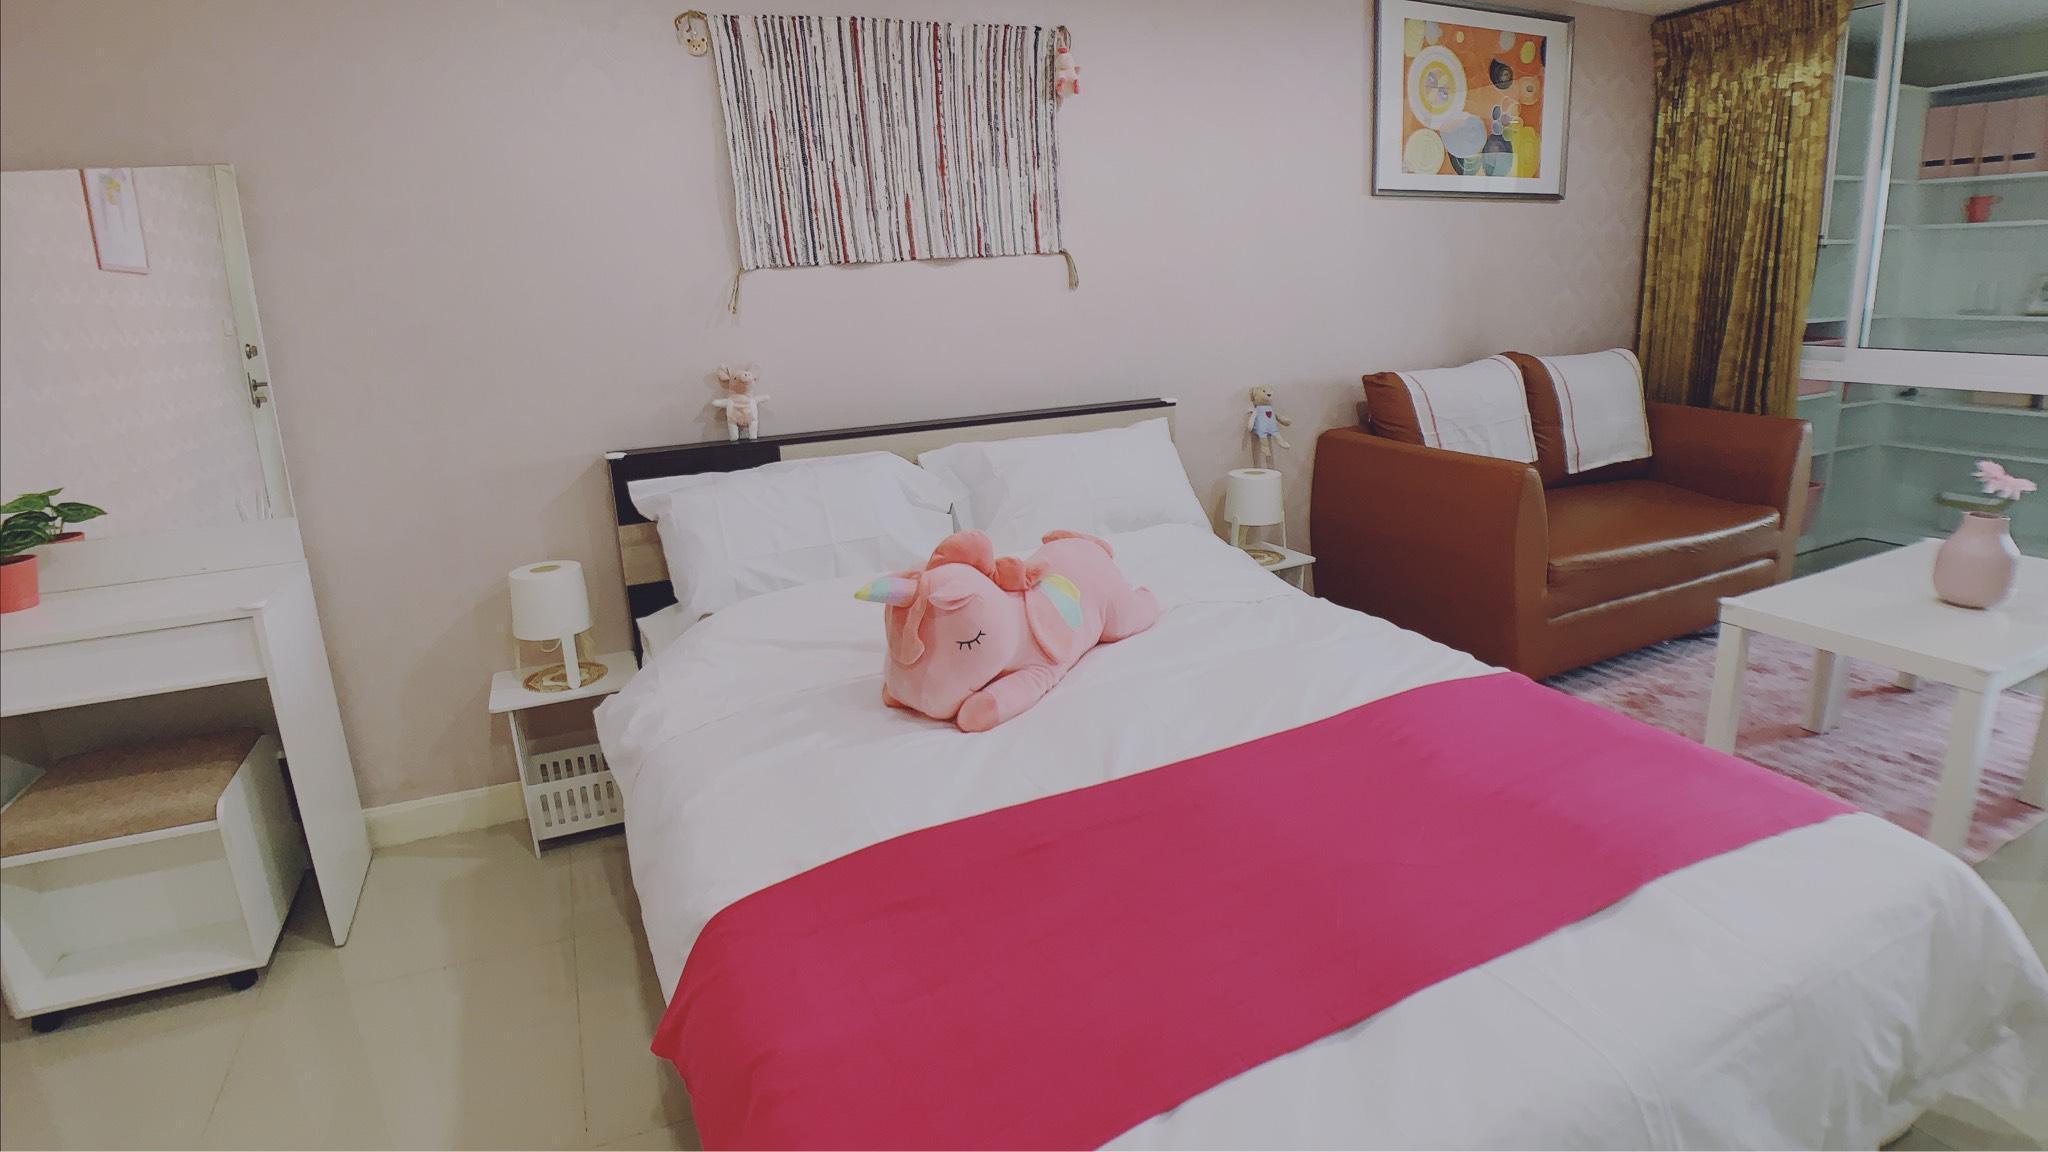 521  Silom Center nearby BTS  sweet pink room อพาร์ตเมนต์ 1 ห้องนอน 1 ห้องน้ำส่วนตัว ขนาด 45 ตร.ม. – สีลม